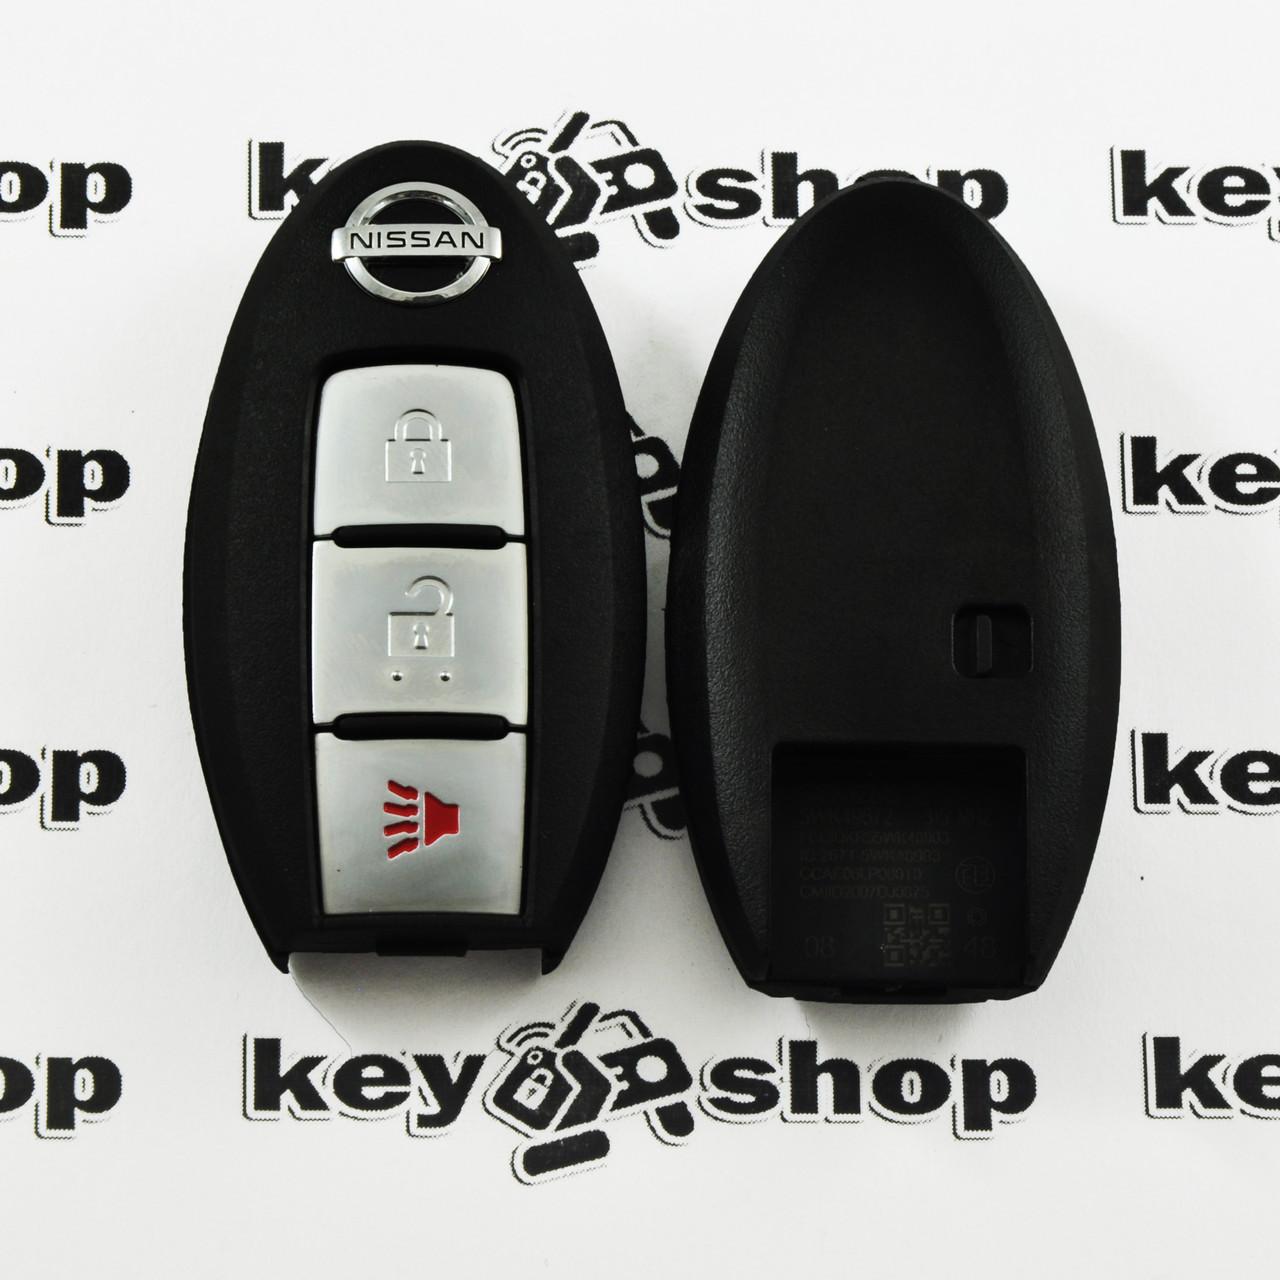 Корпус смарт ключа для NISSAN (корпус) 2 ― кнопки + 1 кнопка (PANIK), (без лезвия)